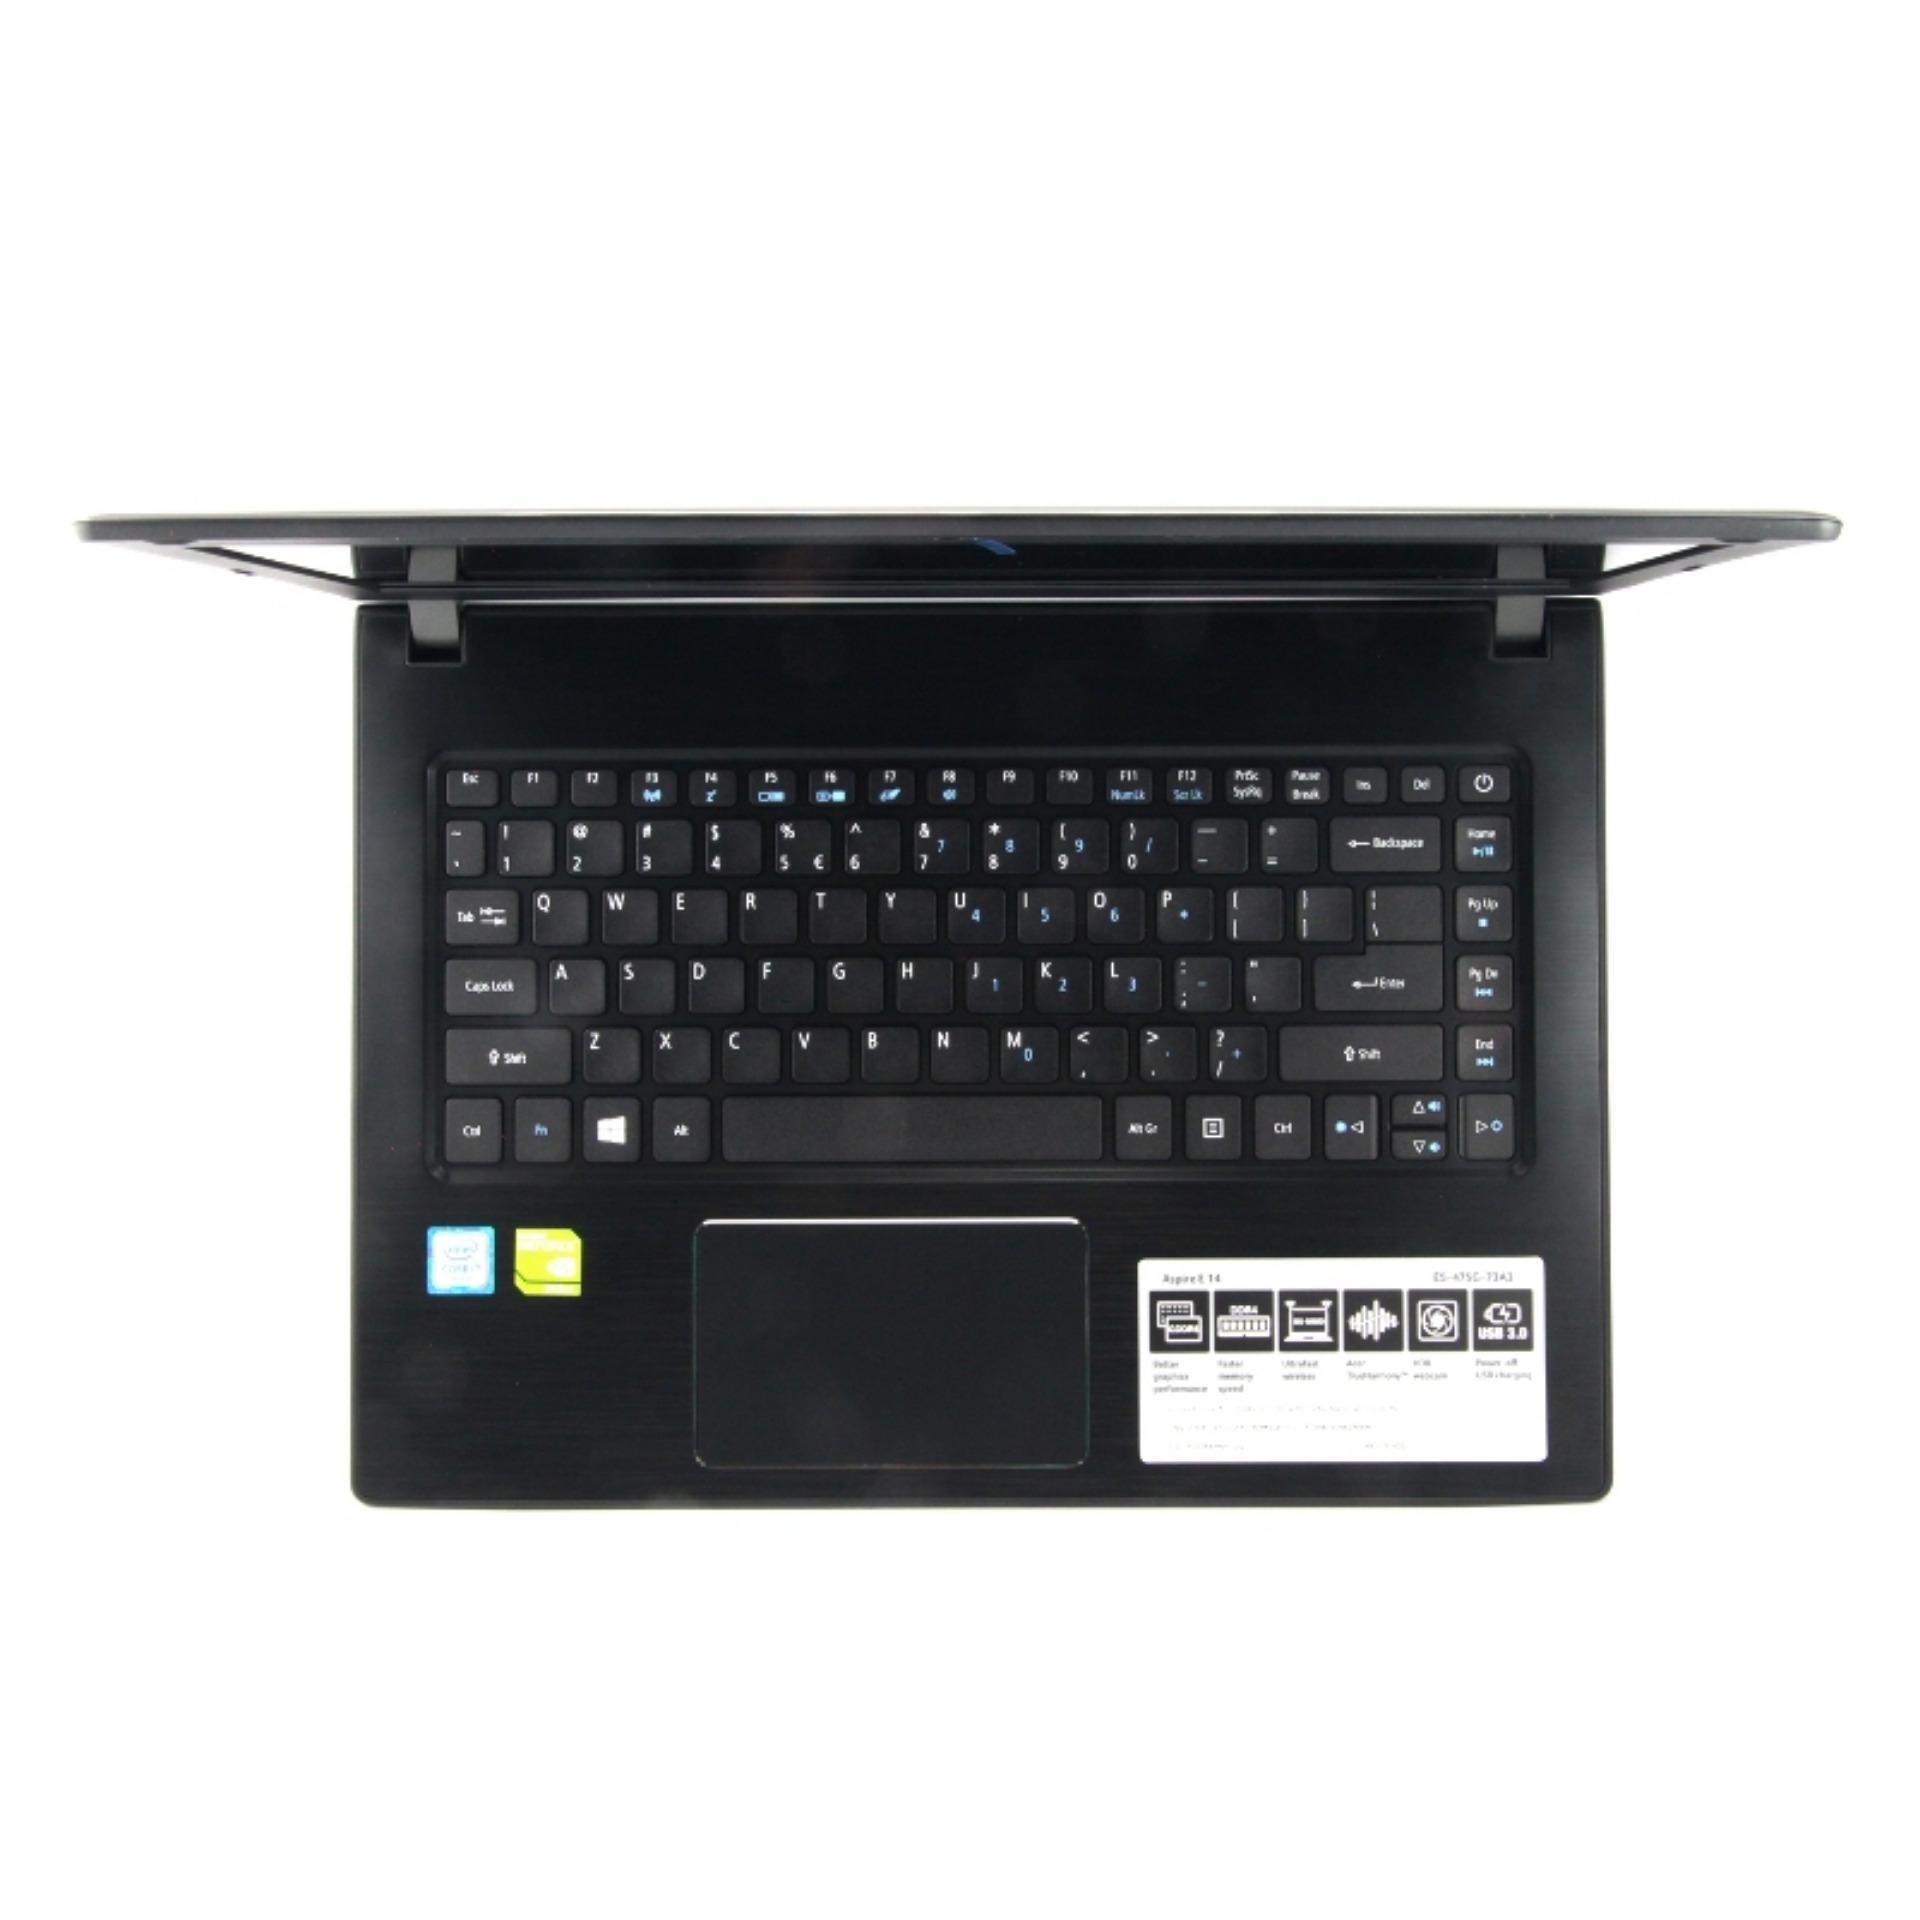 Msi Gt72s 6qe Dominator Pro G 173 Full Hd Intelr Coretm I7 16gbram Laptop Baru Hp Probook 440 G4 I5 7200u Layar 140inch Led Windows 10 Asus Rog G752vy Gc344t Intel Core 6700hq Nvidia Geforce Gtx980m